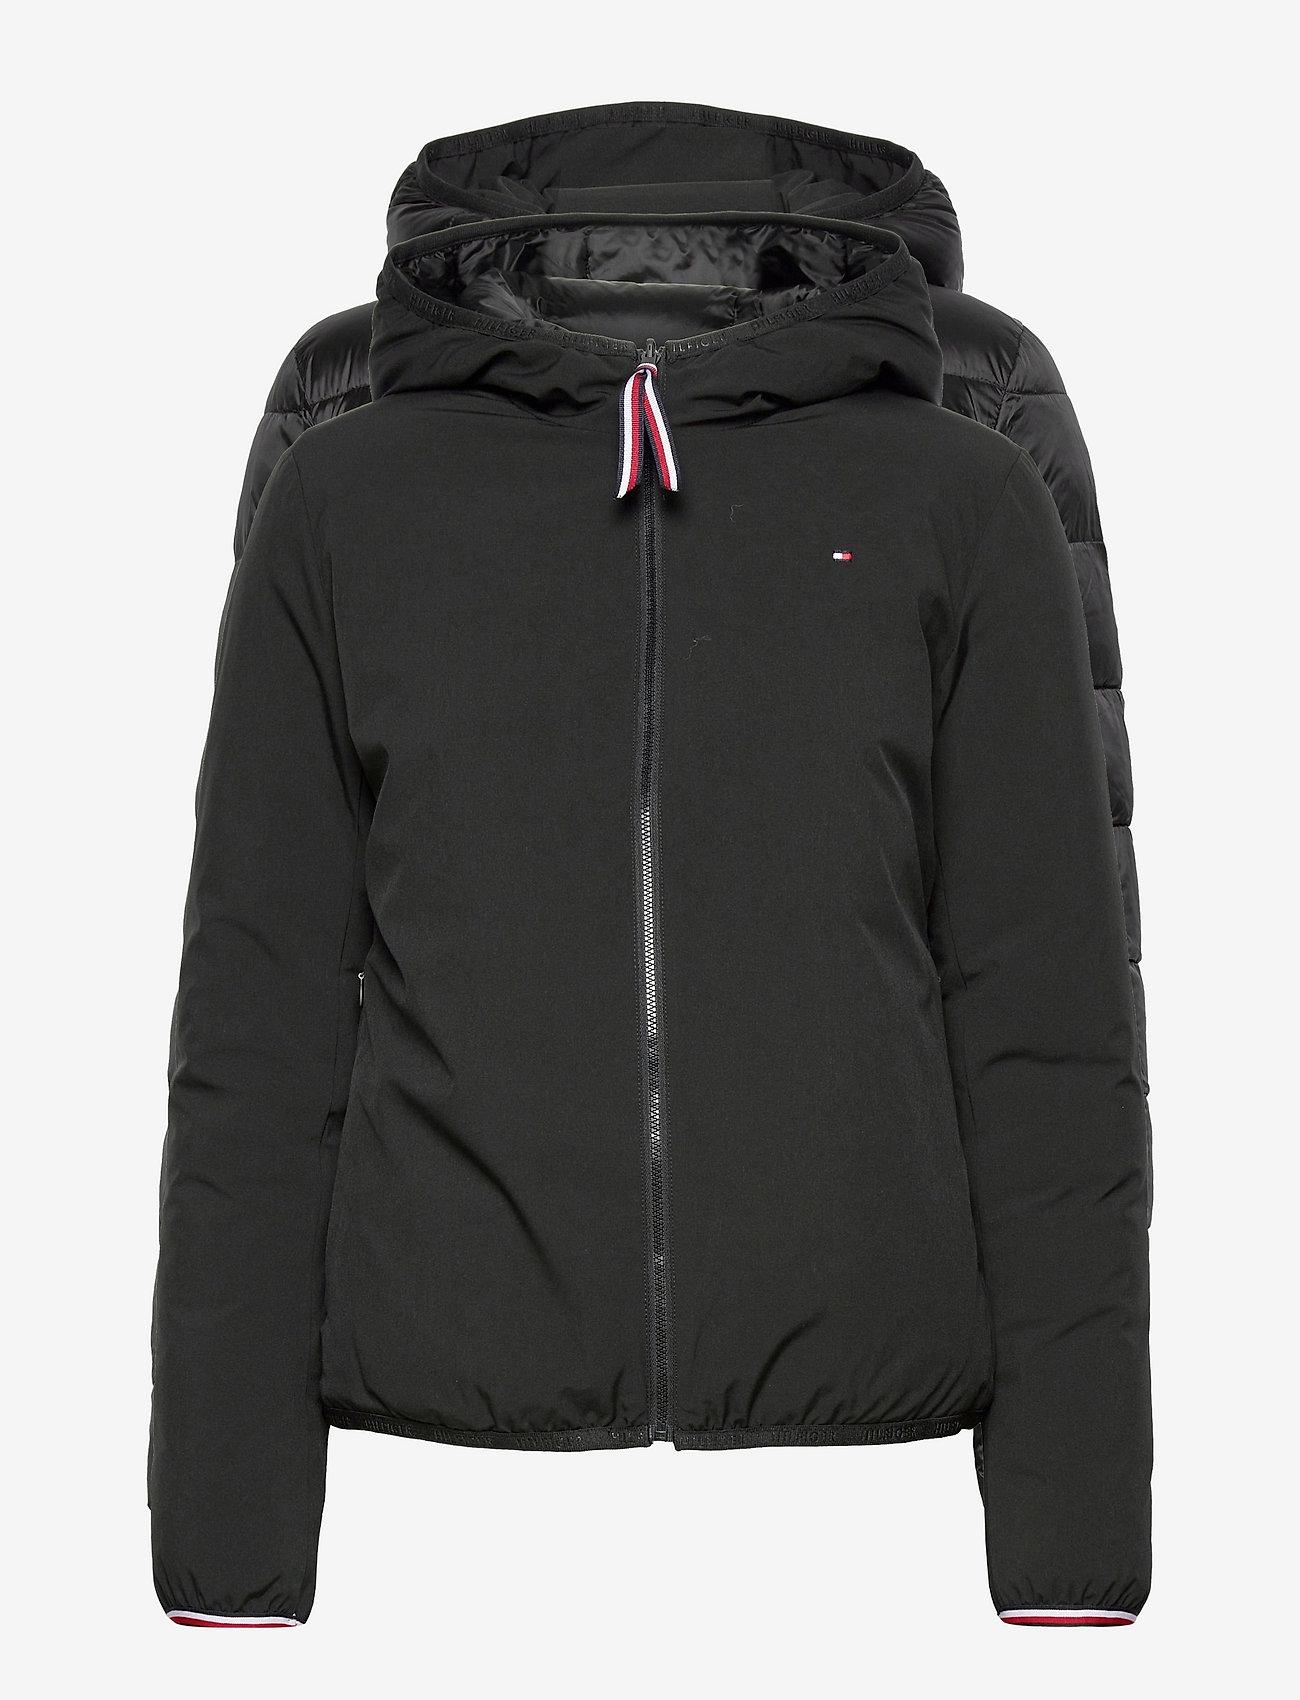 Tommy Hilfiger - TH ESS REVERSIBLE PADDED JACKET - winter jackets - black - 0